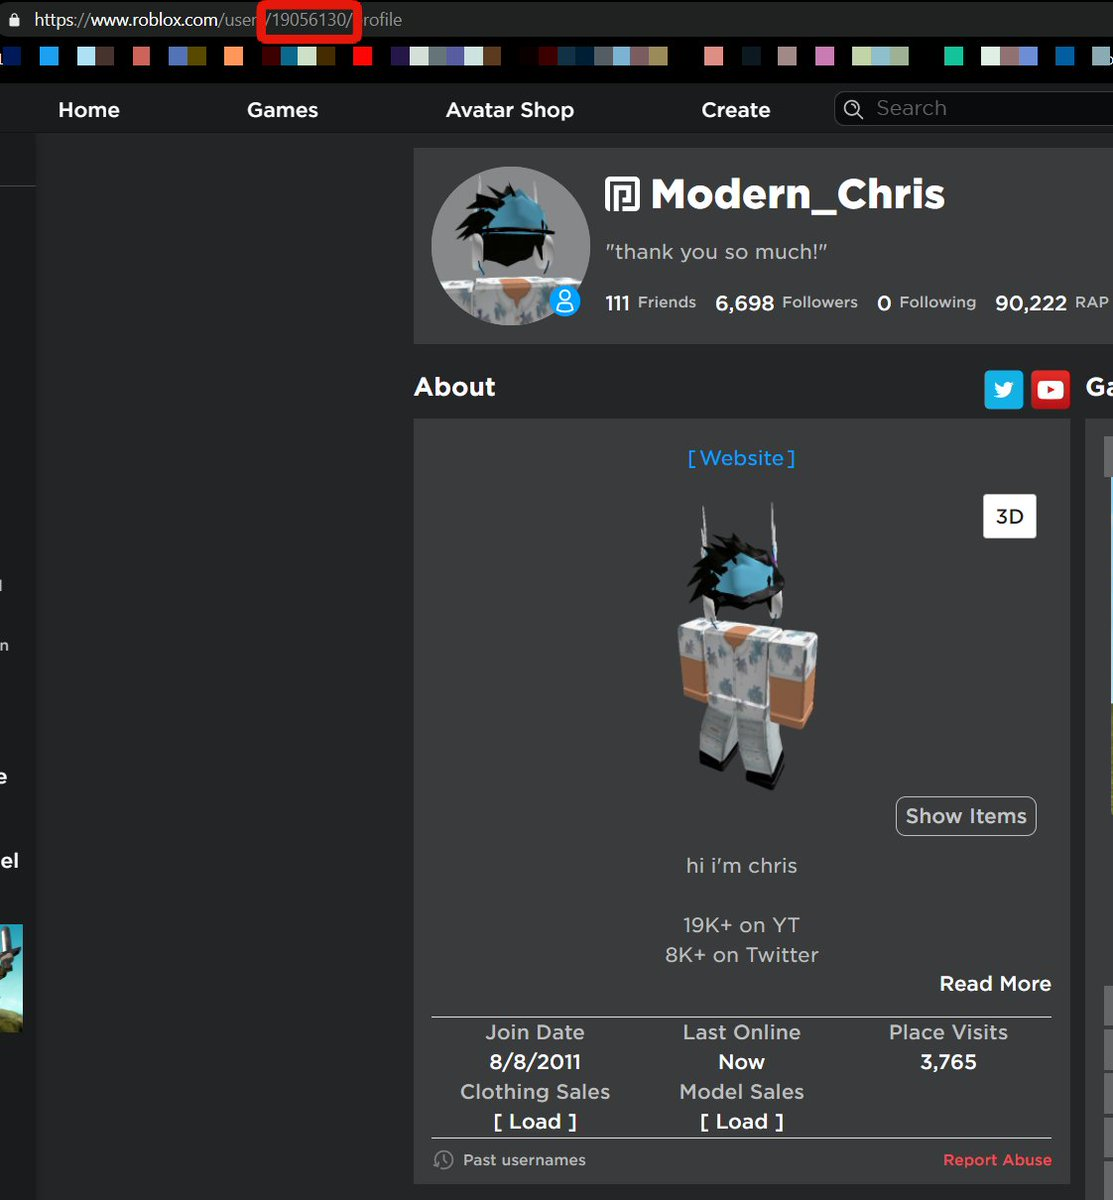 How To Get Your User Id In Roblox لم يسبق له مثيل الصور Tier3 Xyz